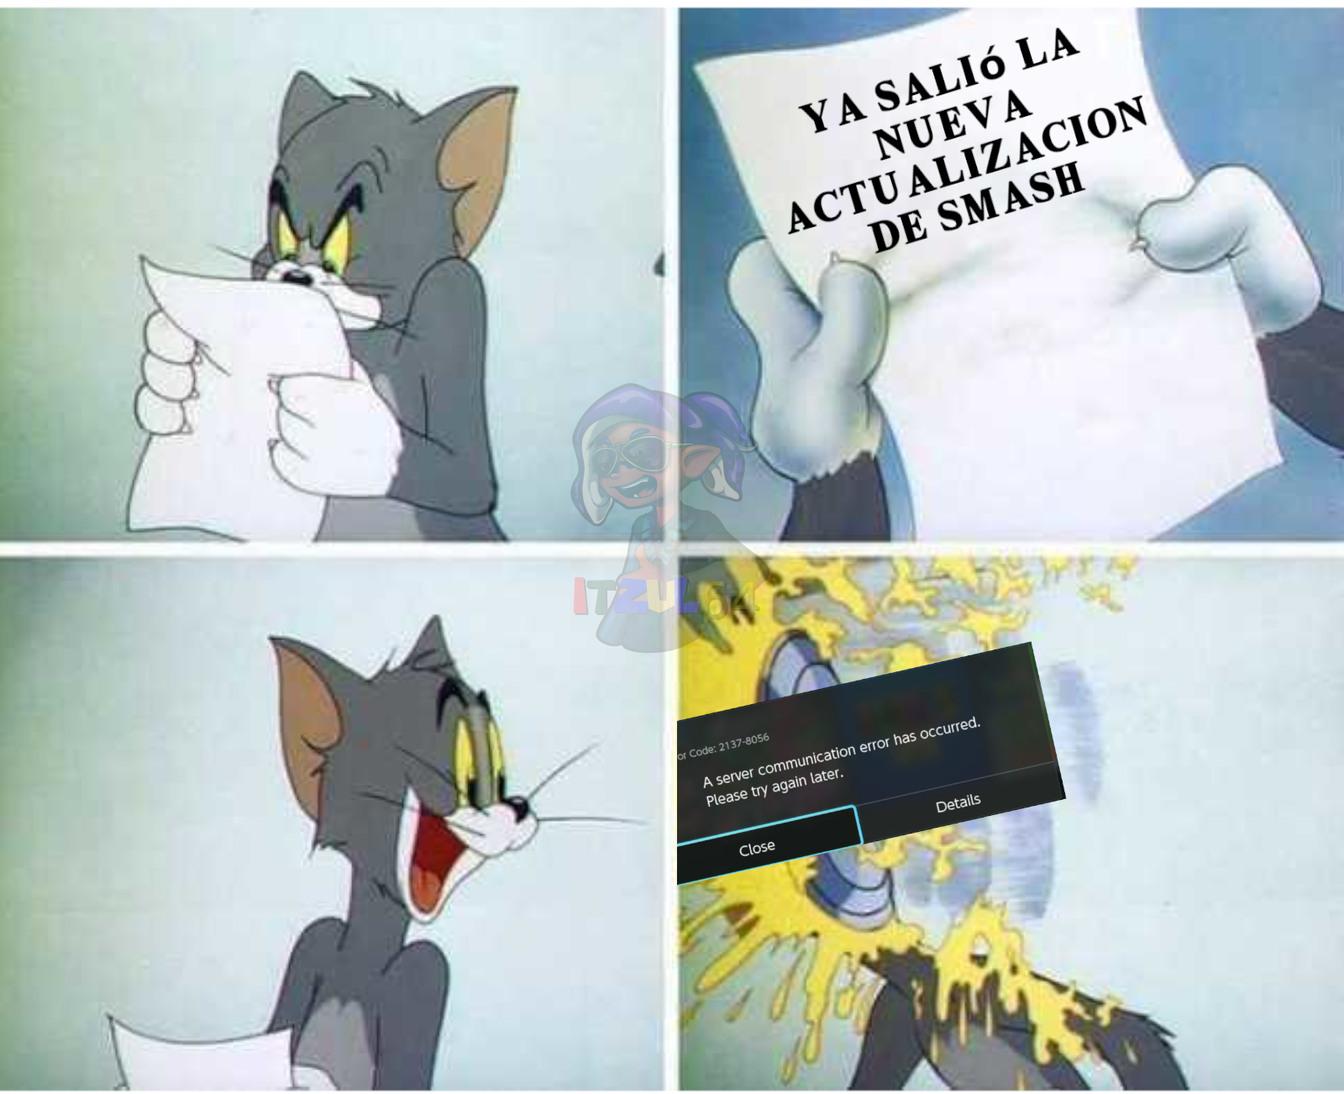 Actualizaciones vergas - meme